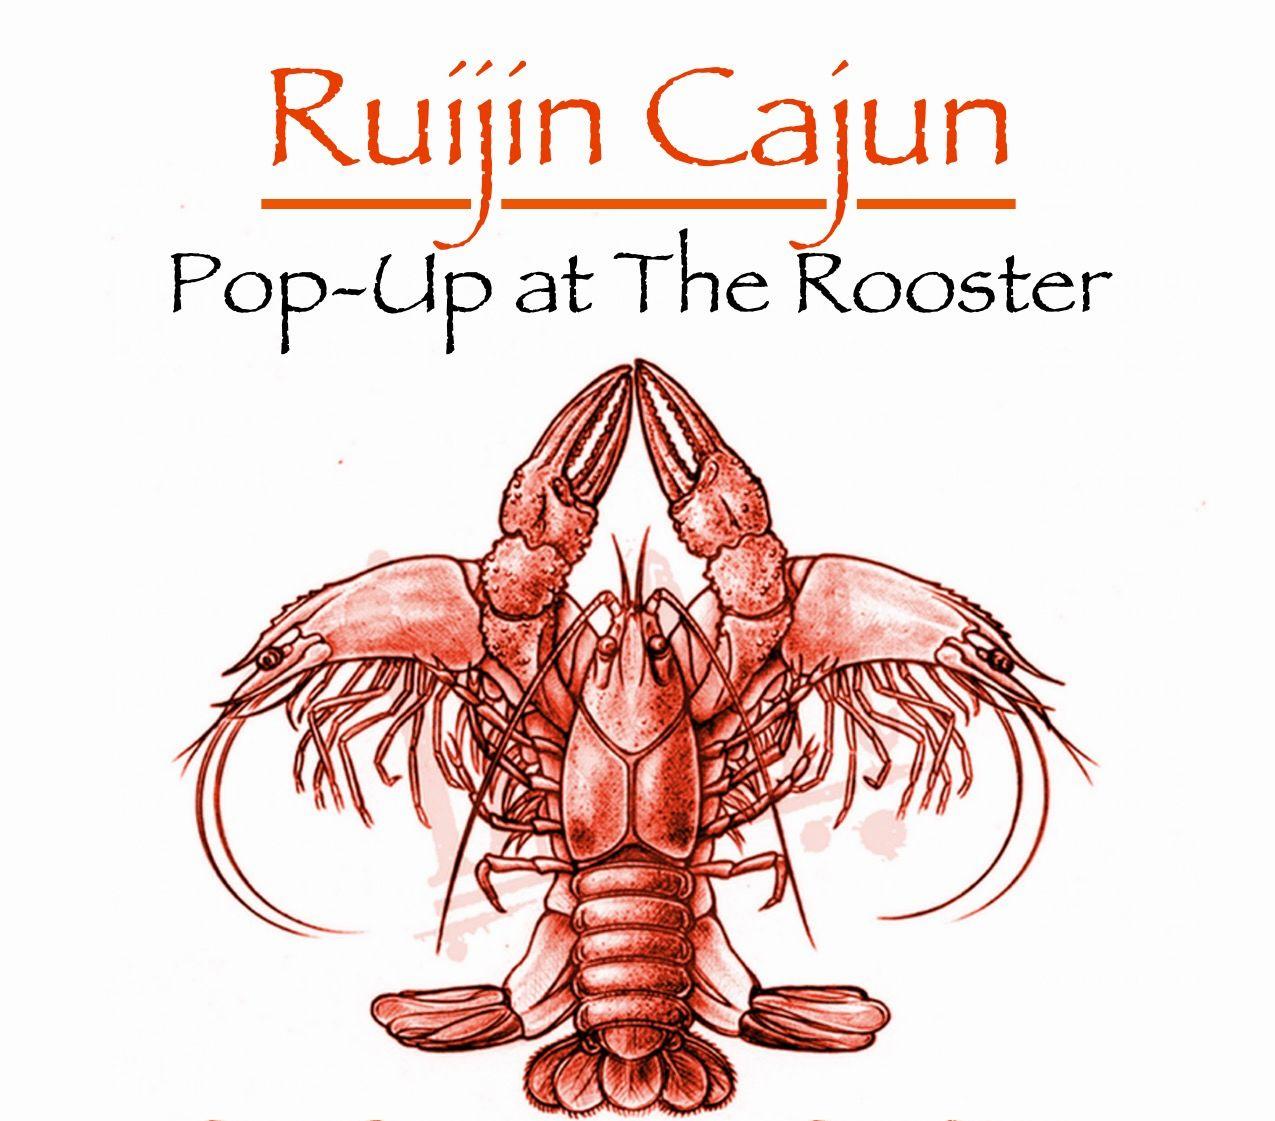 Soundbite: Ruijin Cajun Pop-Up at The Rooster